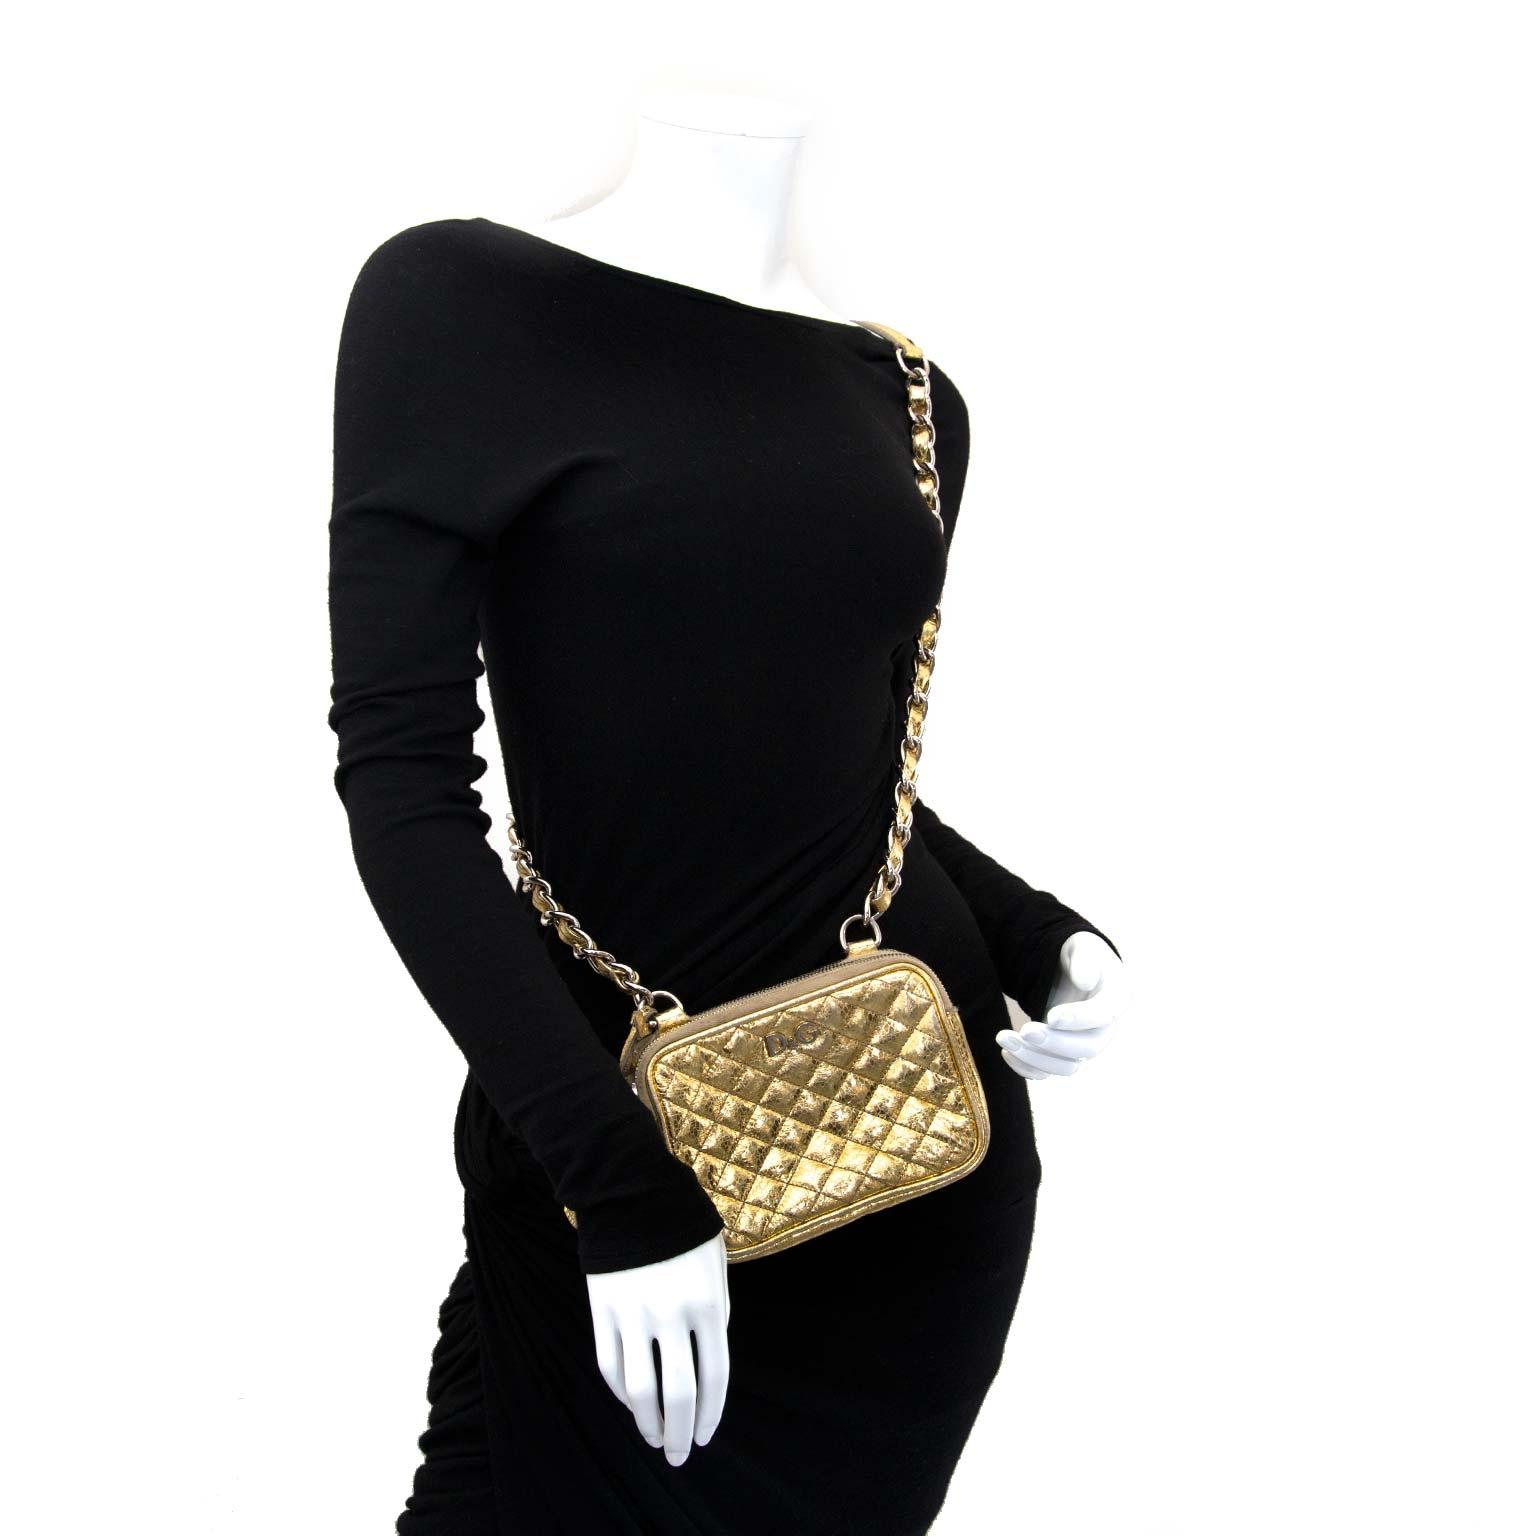 dolce & gabbana gold metallic crossbody bag now for sale at labellov vintage fashion webshop belgium